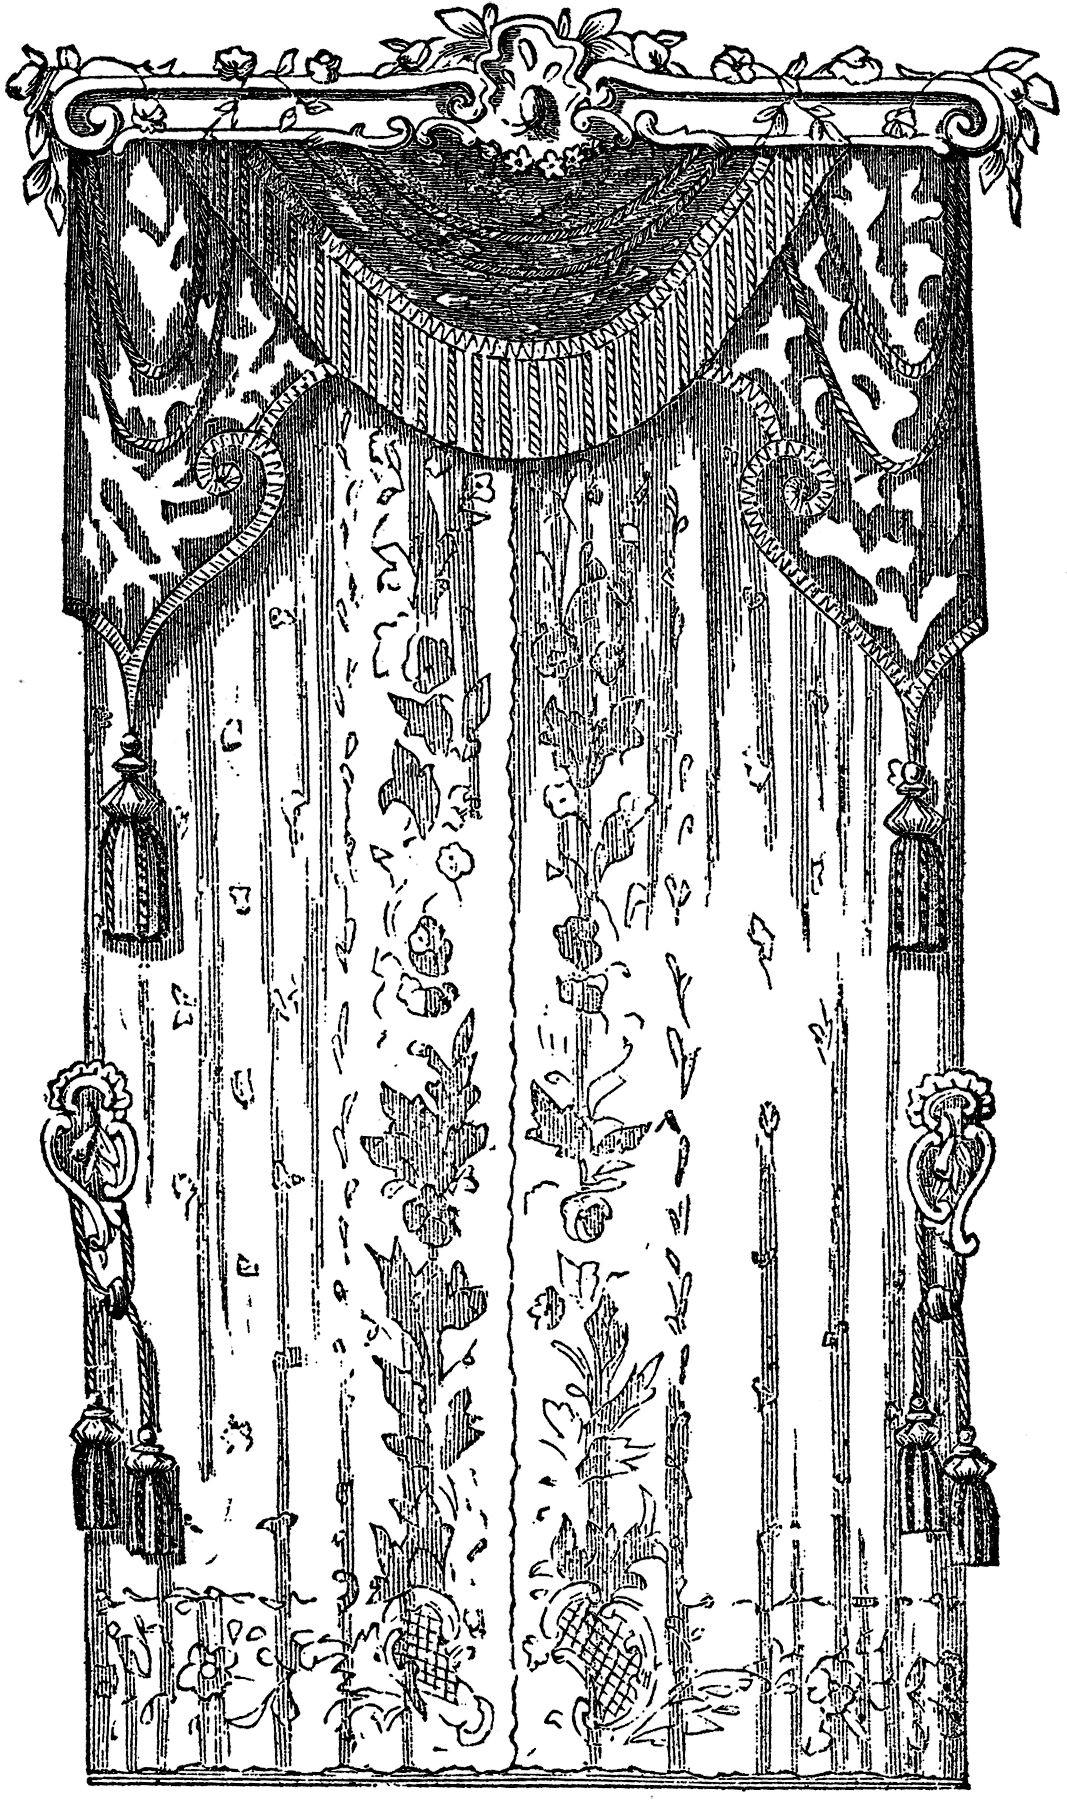 Black lace curtains vintage - Lace Curtains Stock Image